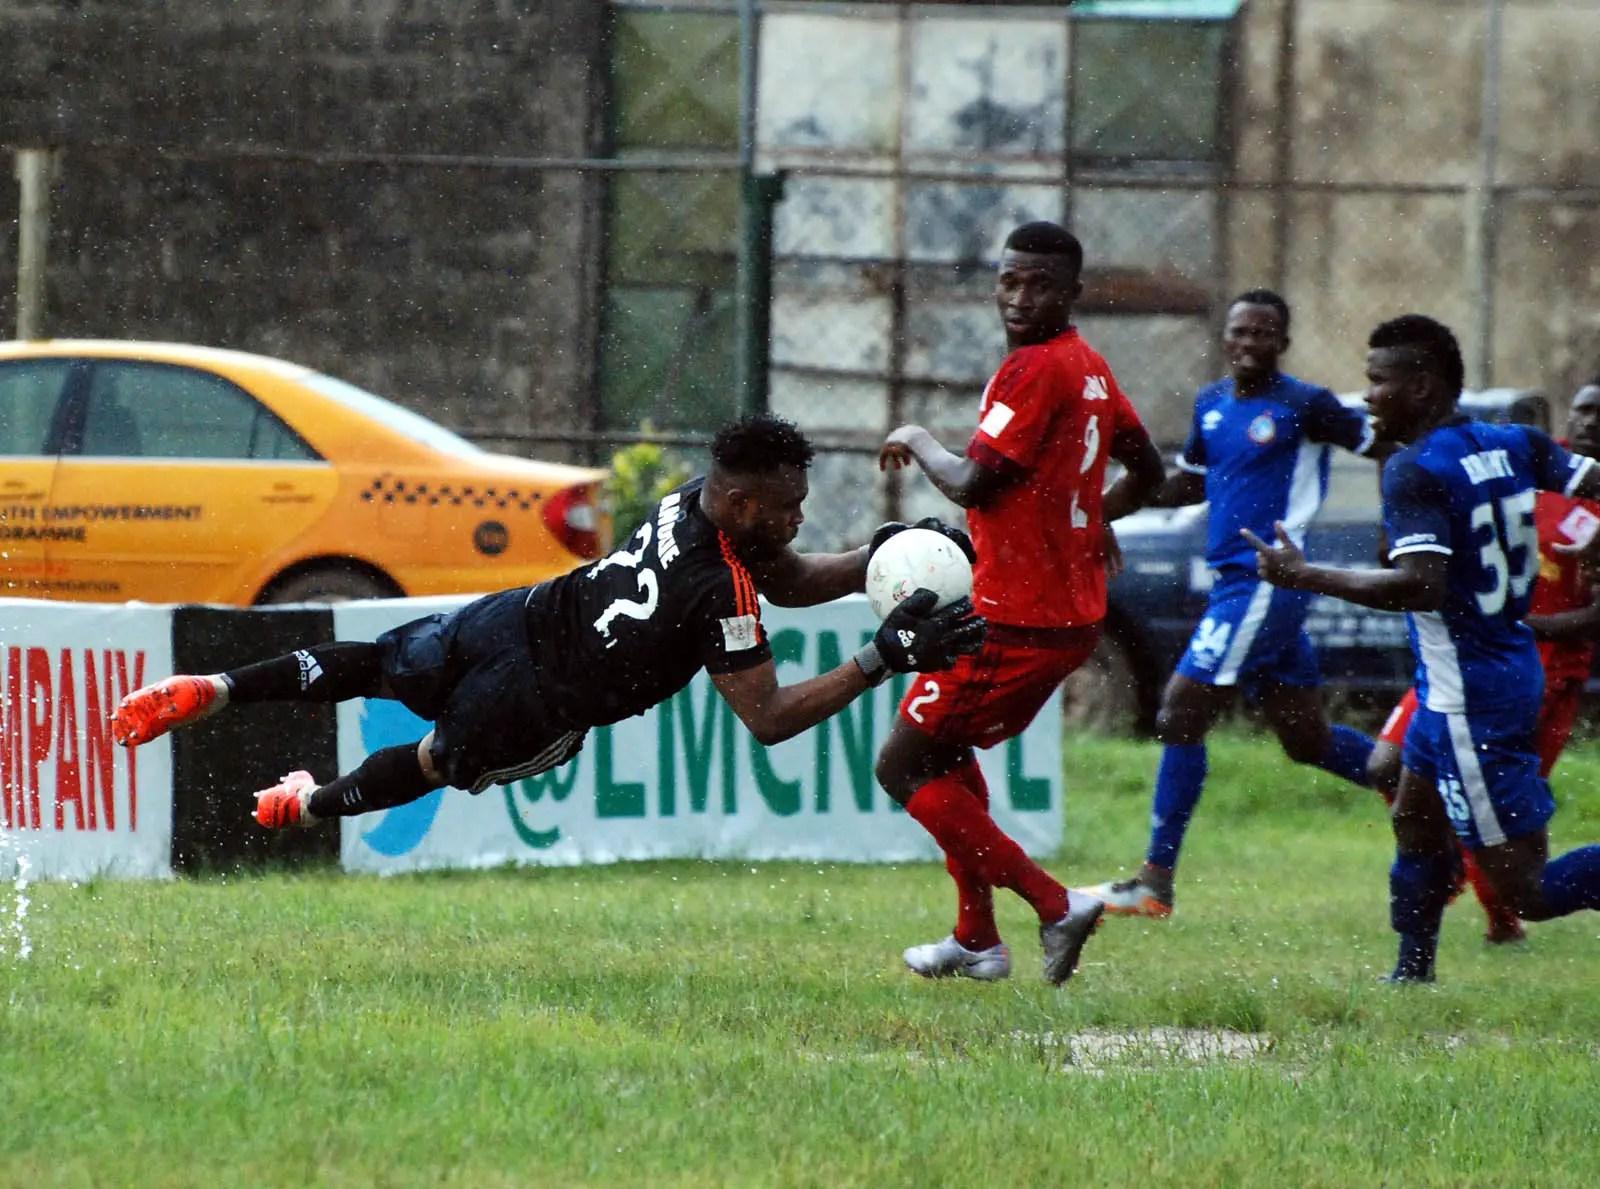 NPFL: Abia Warriors Beat Enyimba, Heartland Pip Tornadoes In Escape Bid